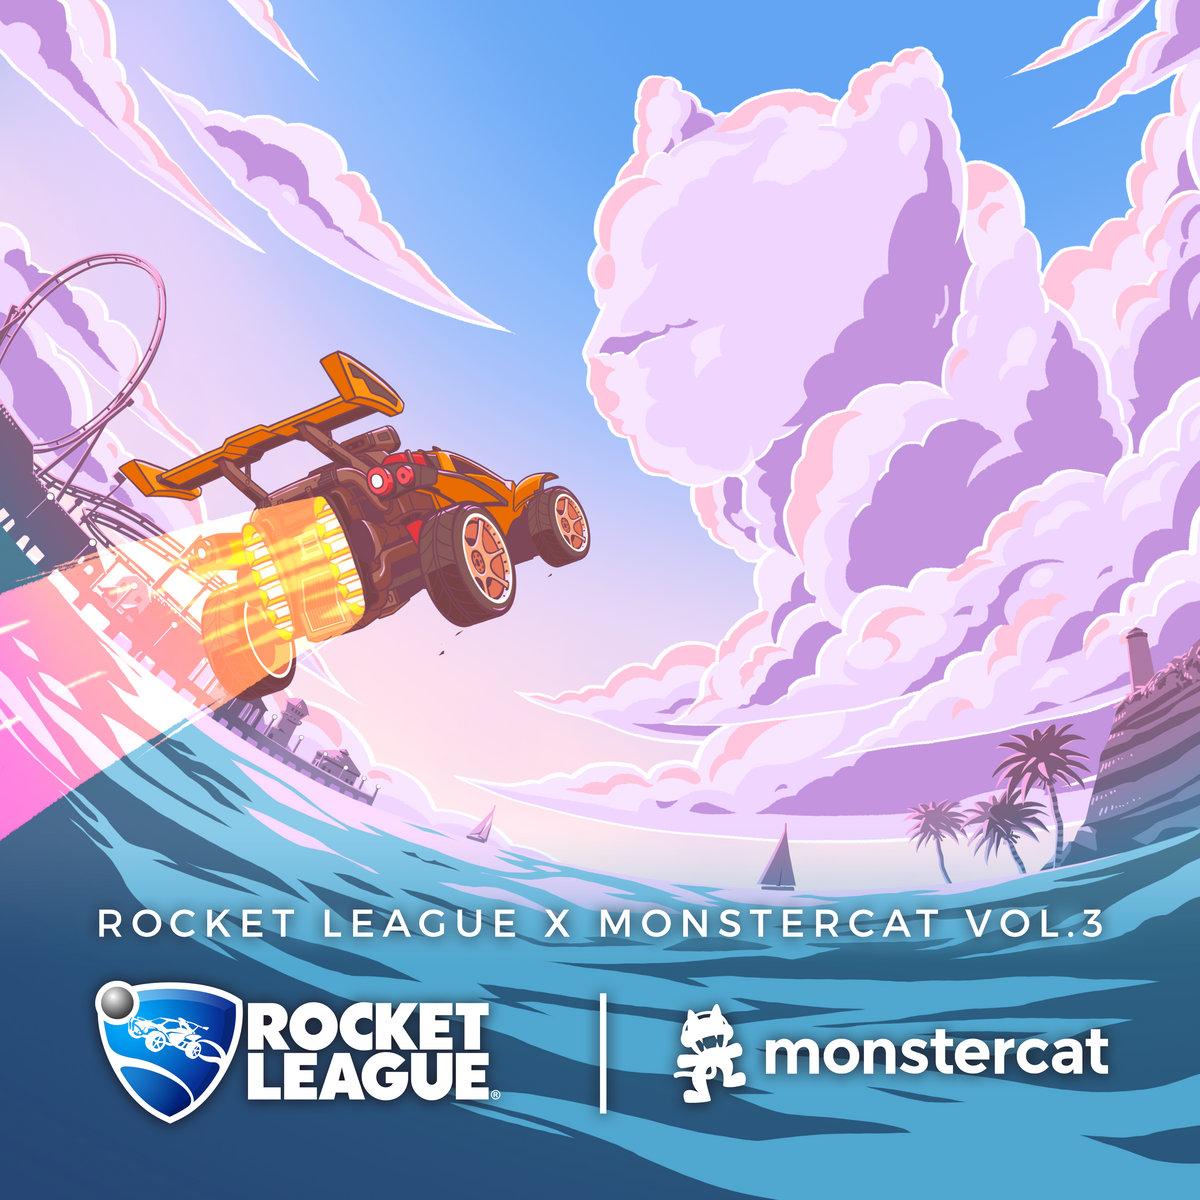 torrent rocket league soundtrack - torrent rocket league soundtrack